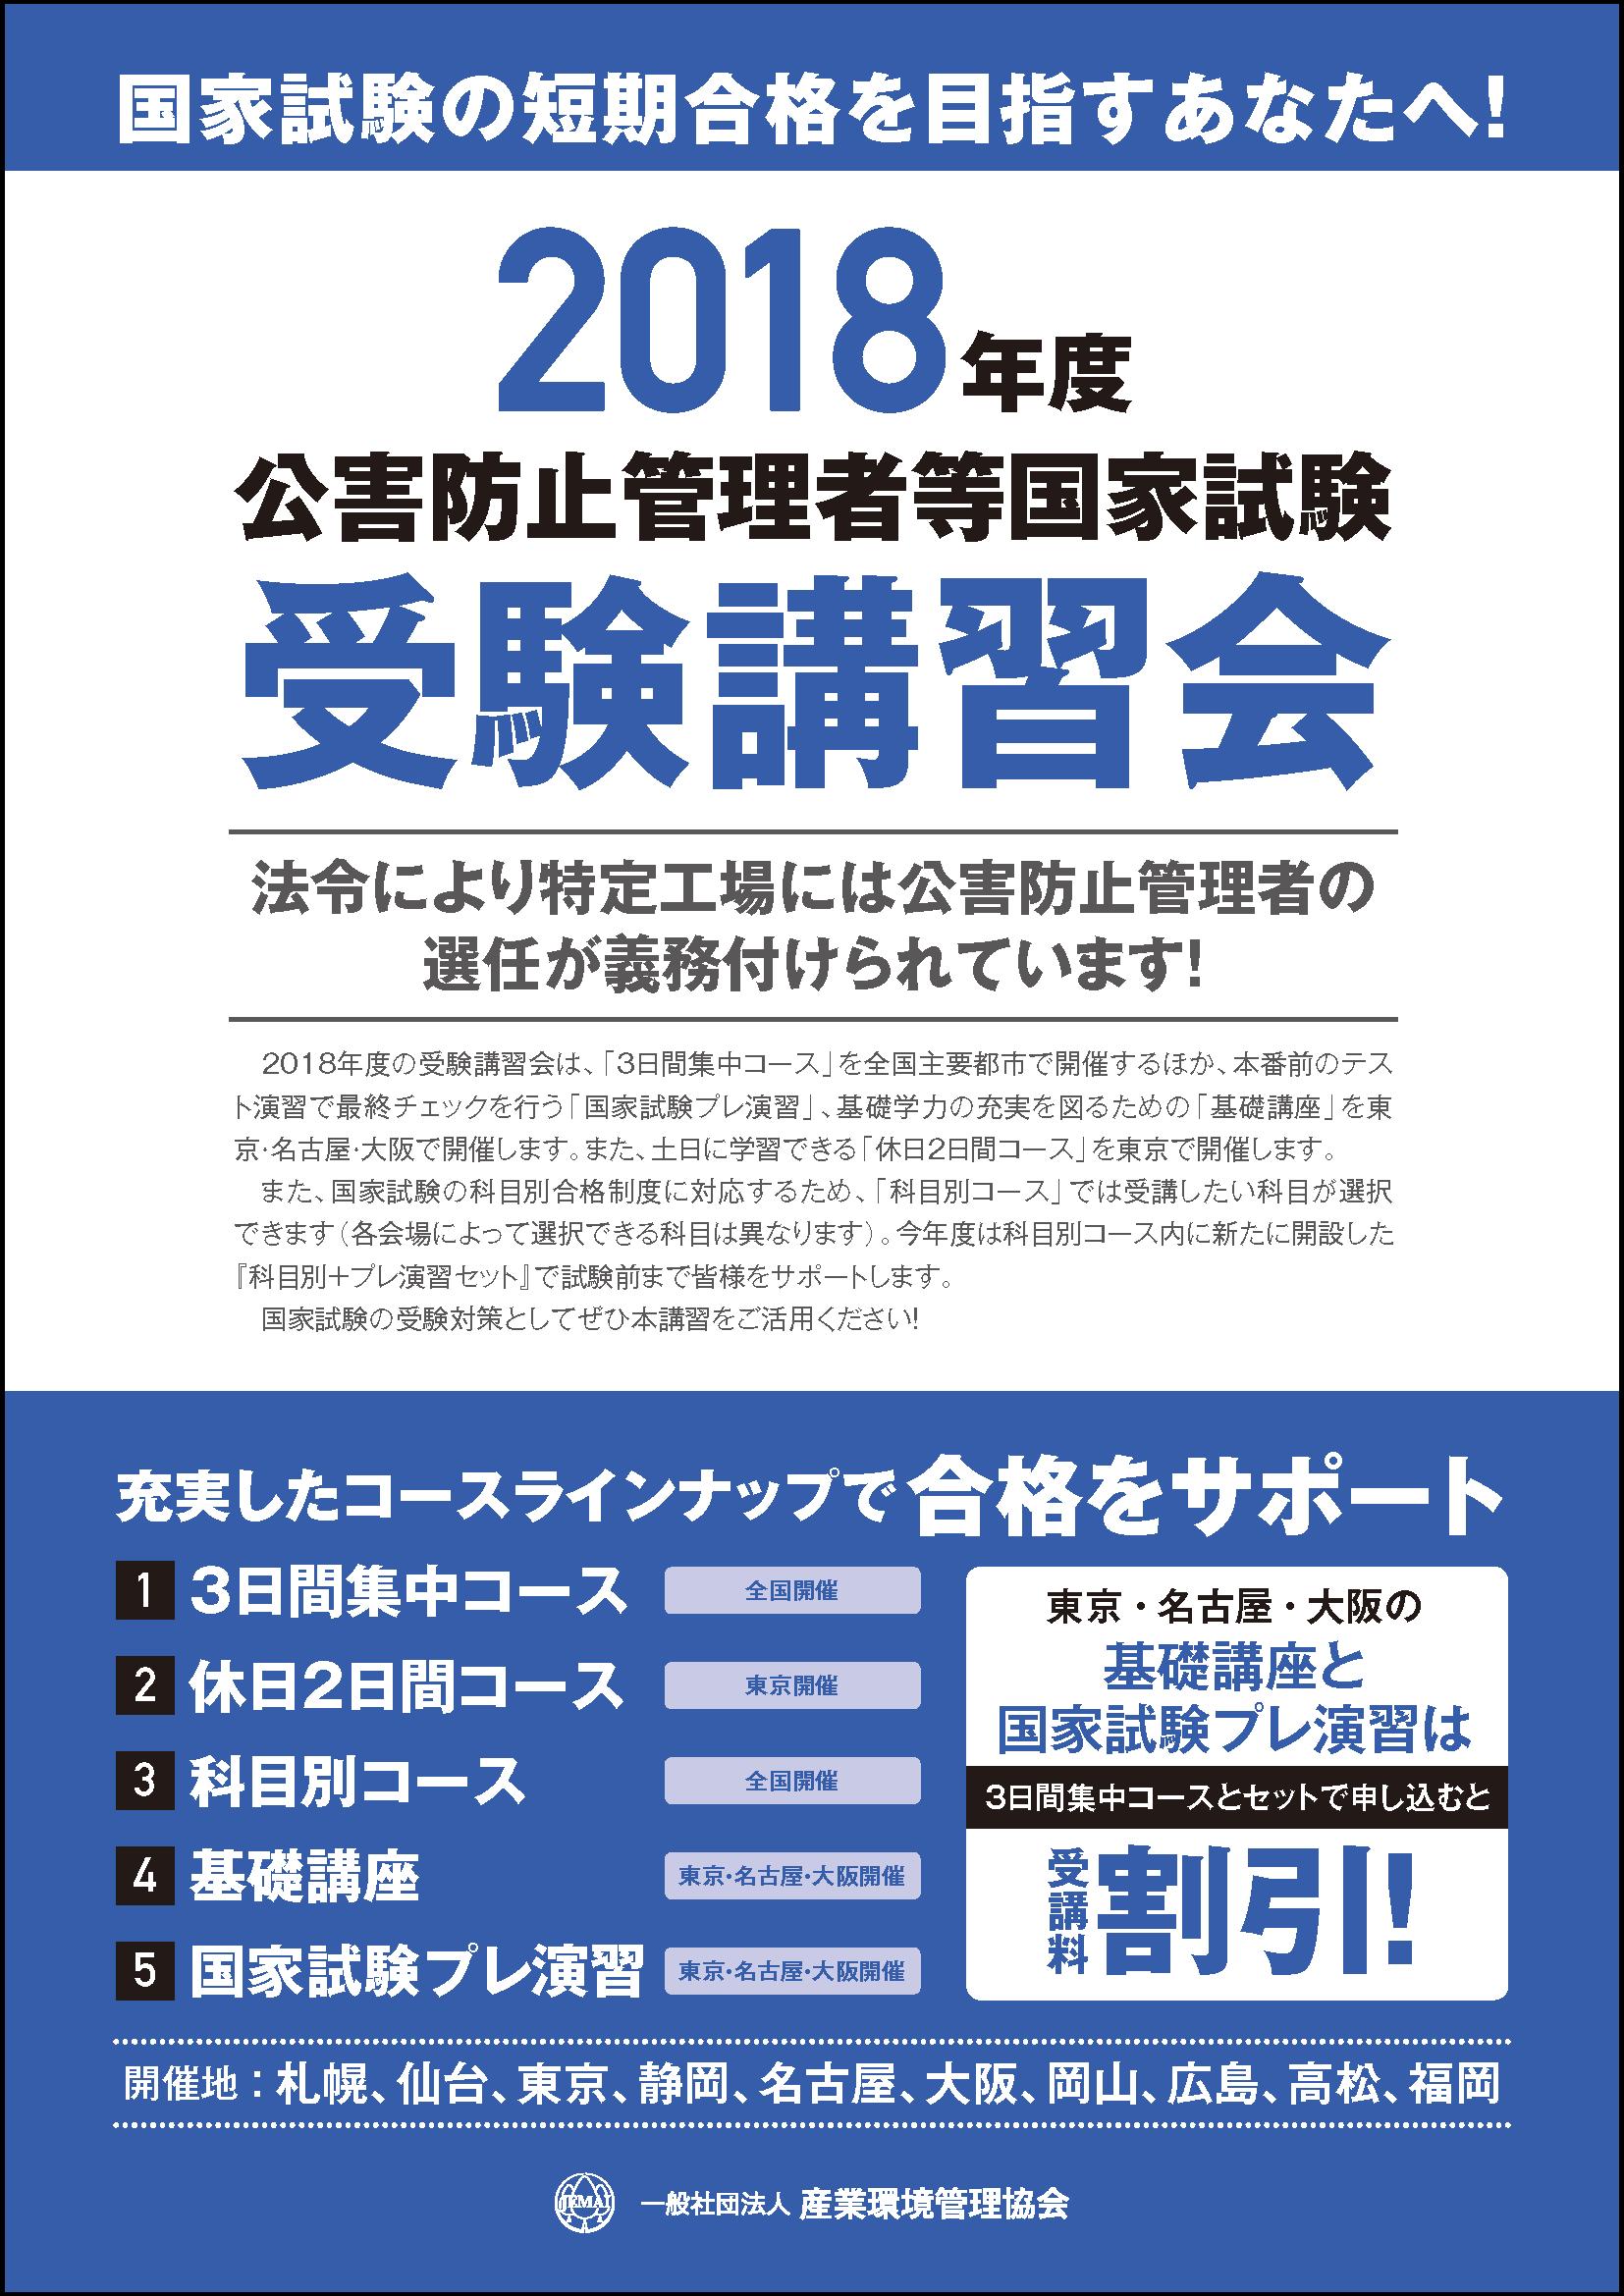 koushu_pamphlet2018_p1.png